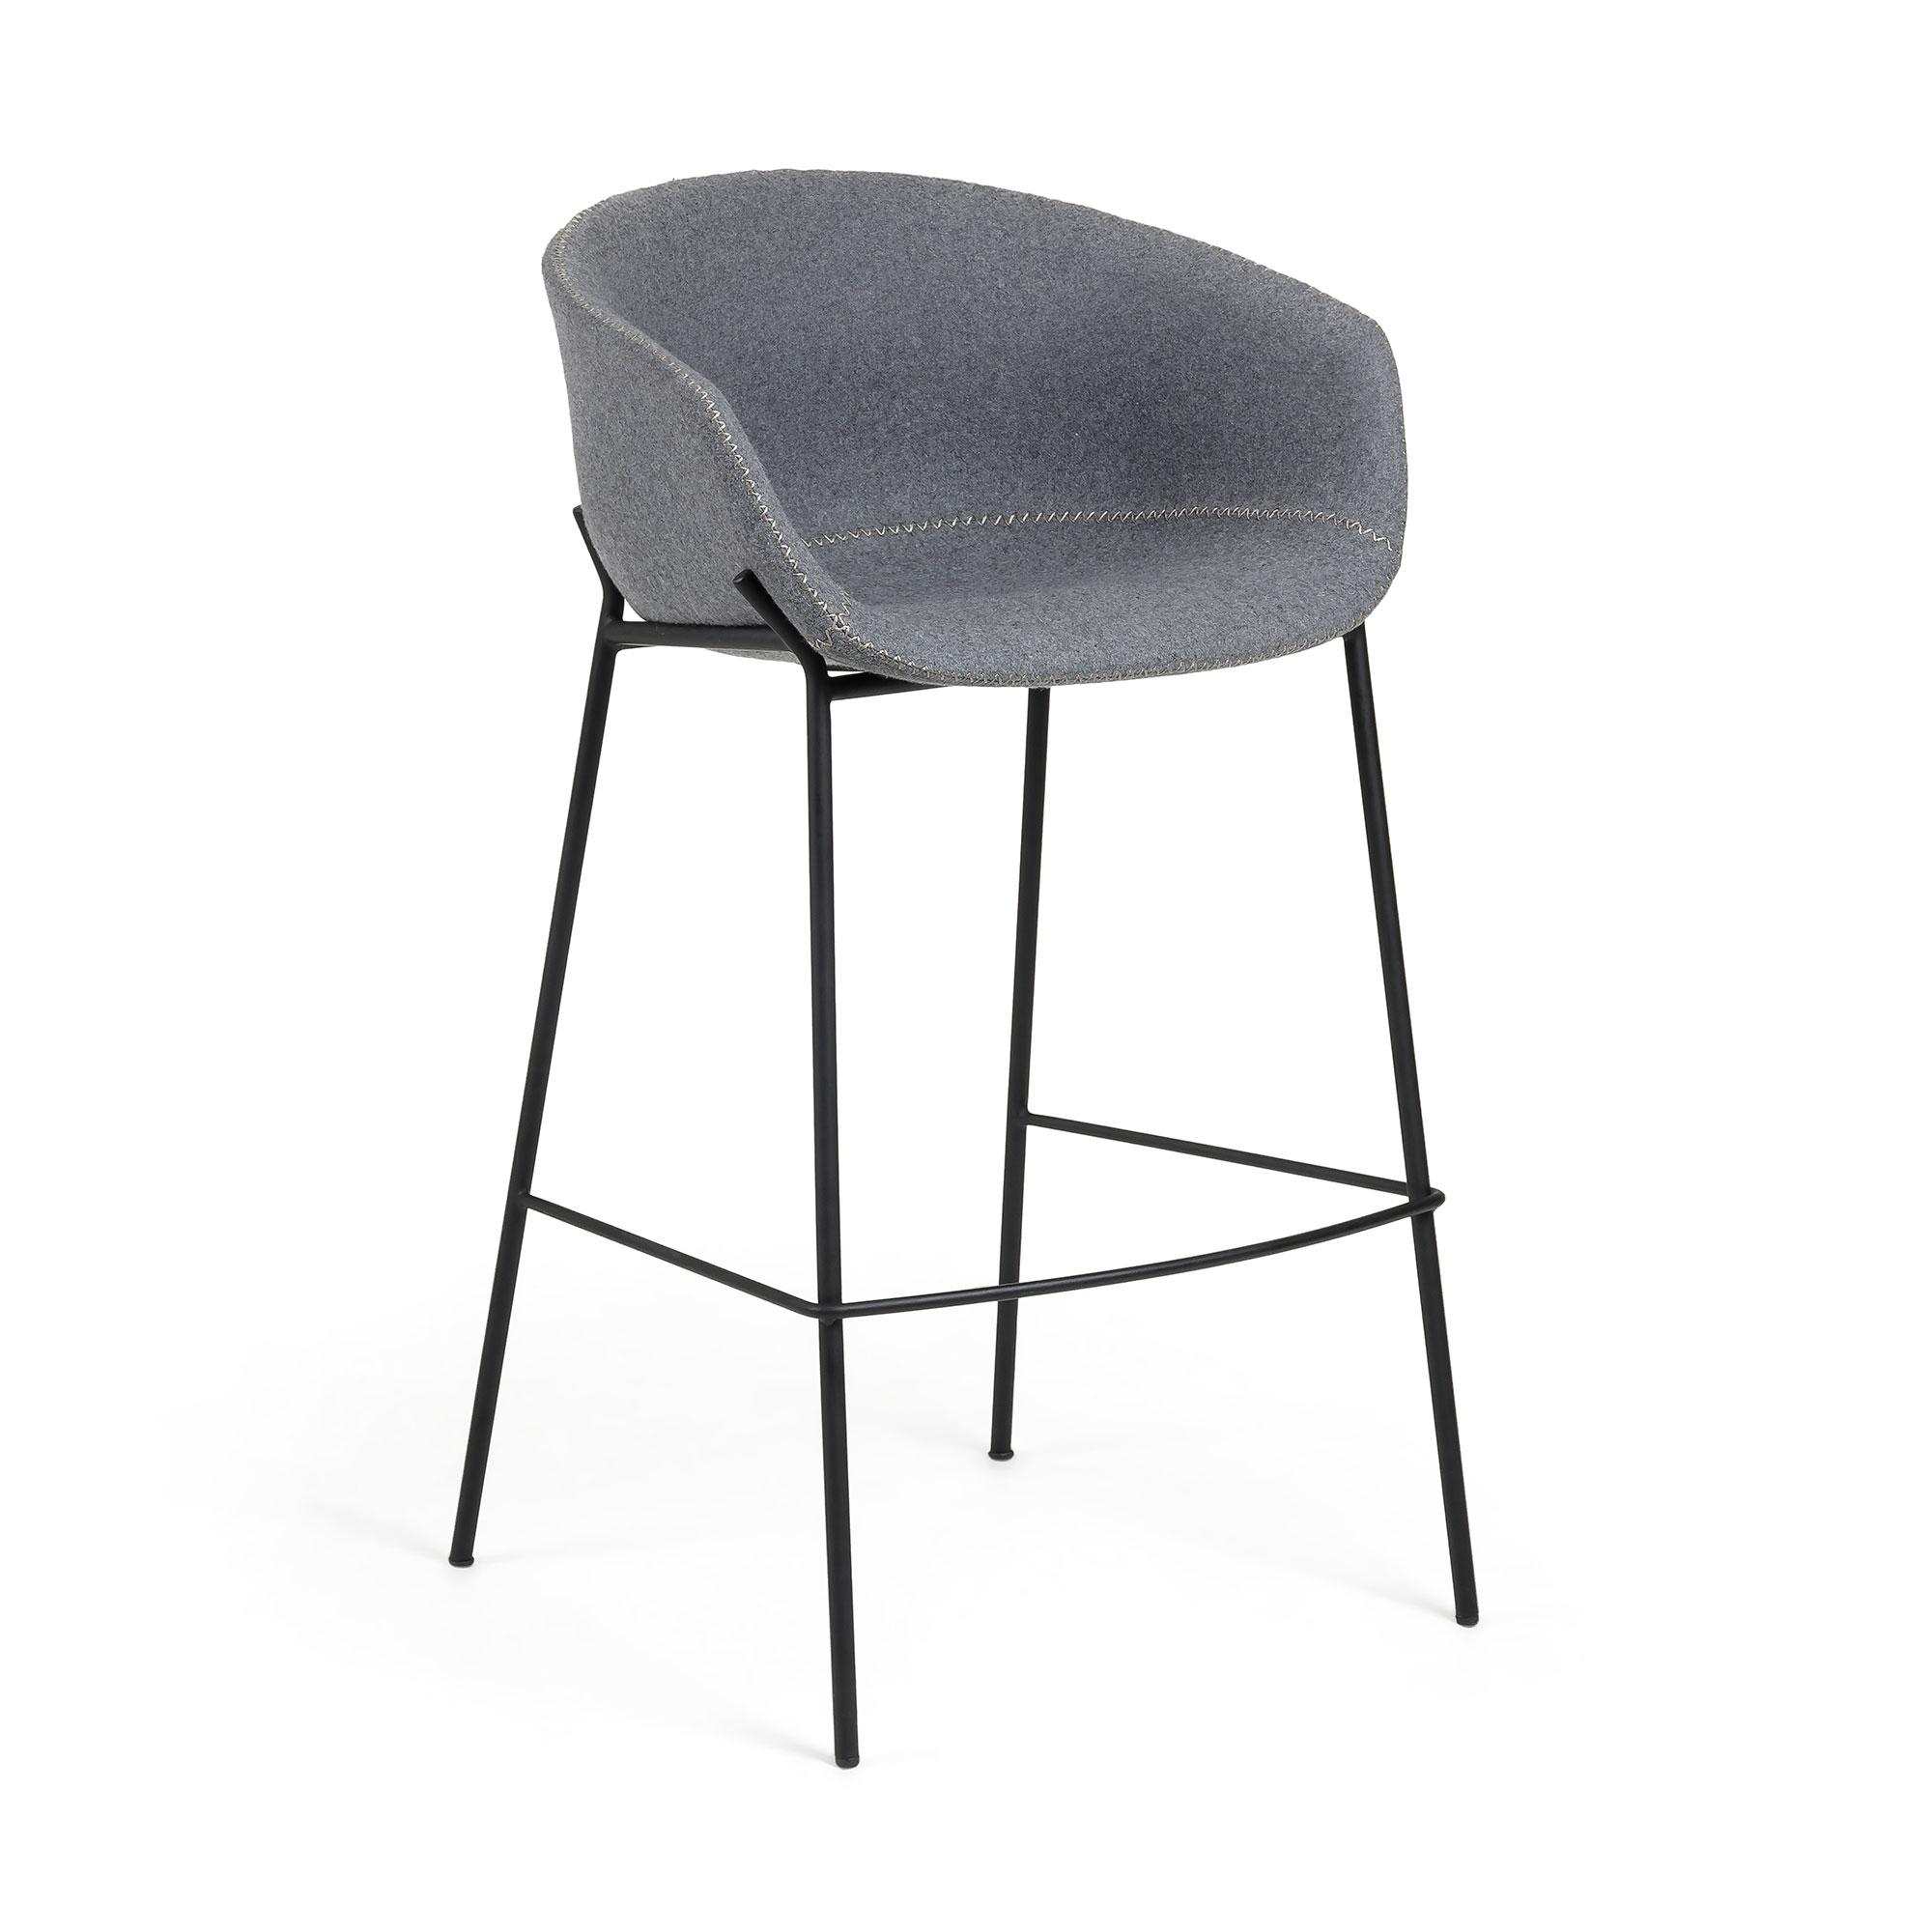 LAFORMA Zadine barstol - grå/sort uld/stål, m. armlæn thumbnail